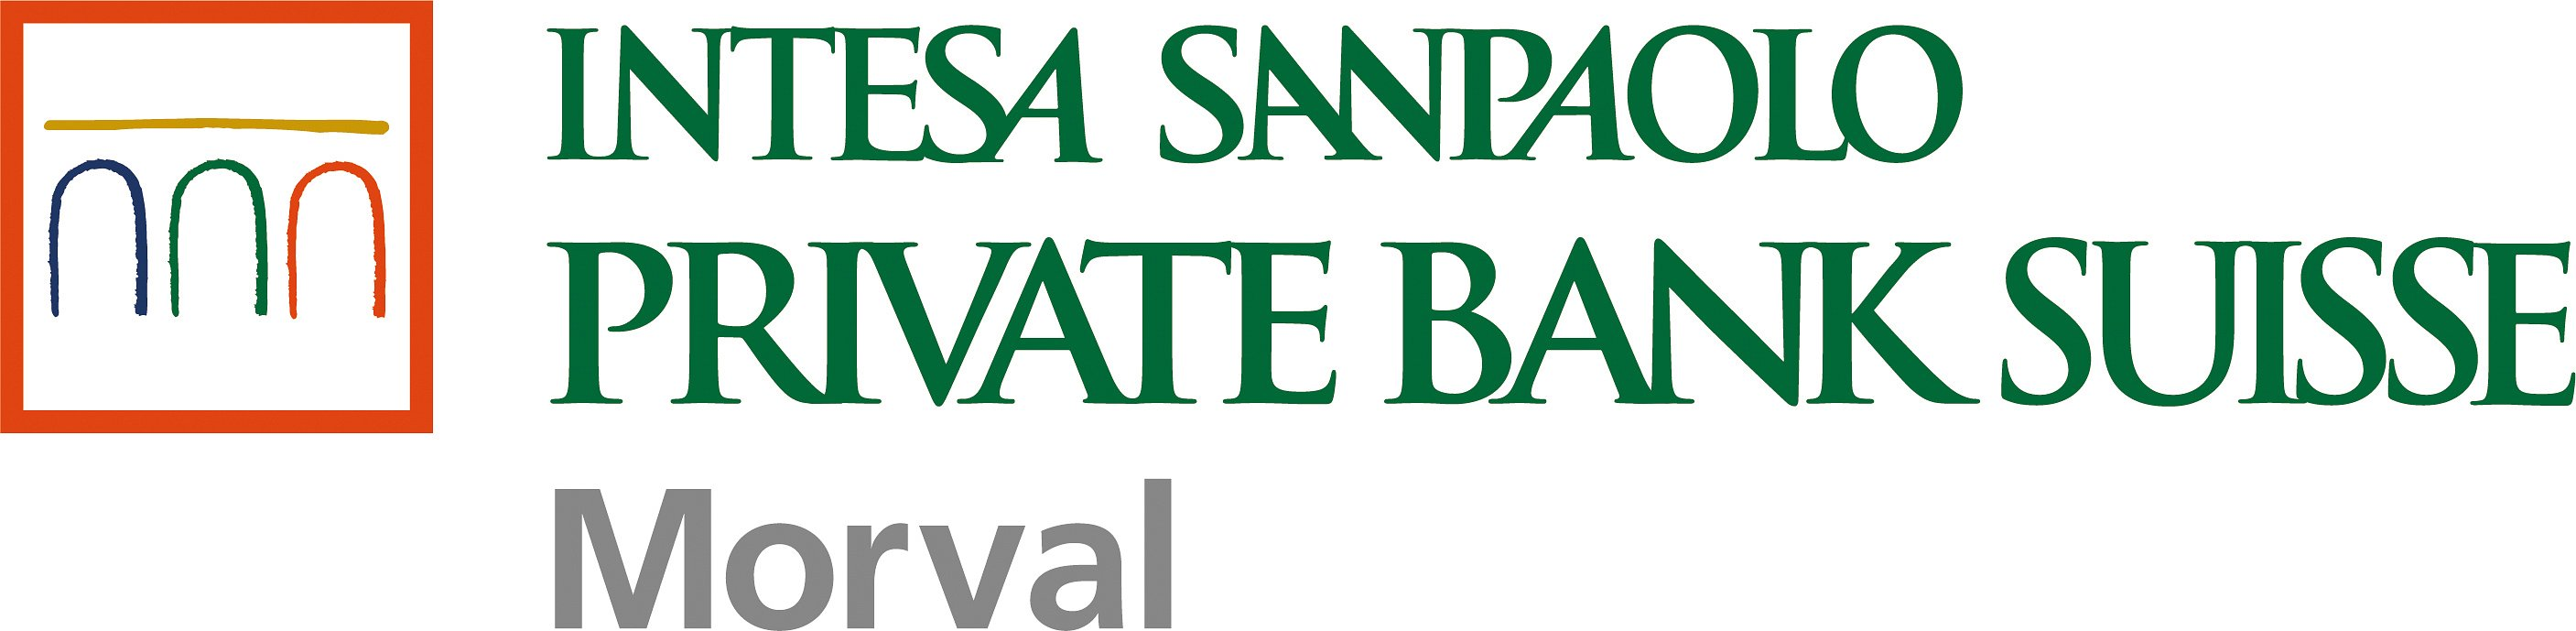 Intesa Sanpaolo Private Bank (Suisse) Morval SA